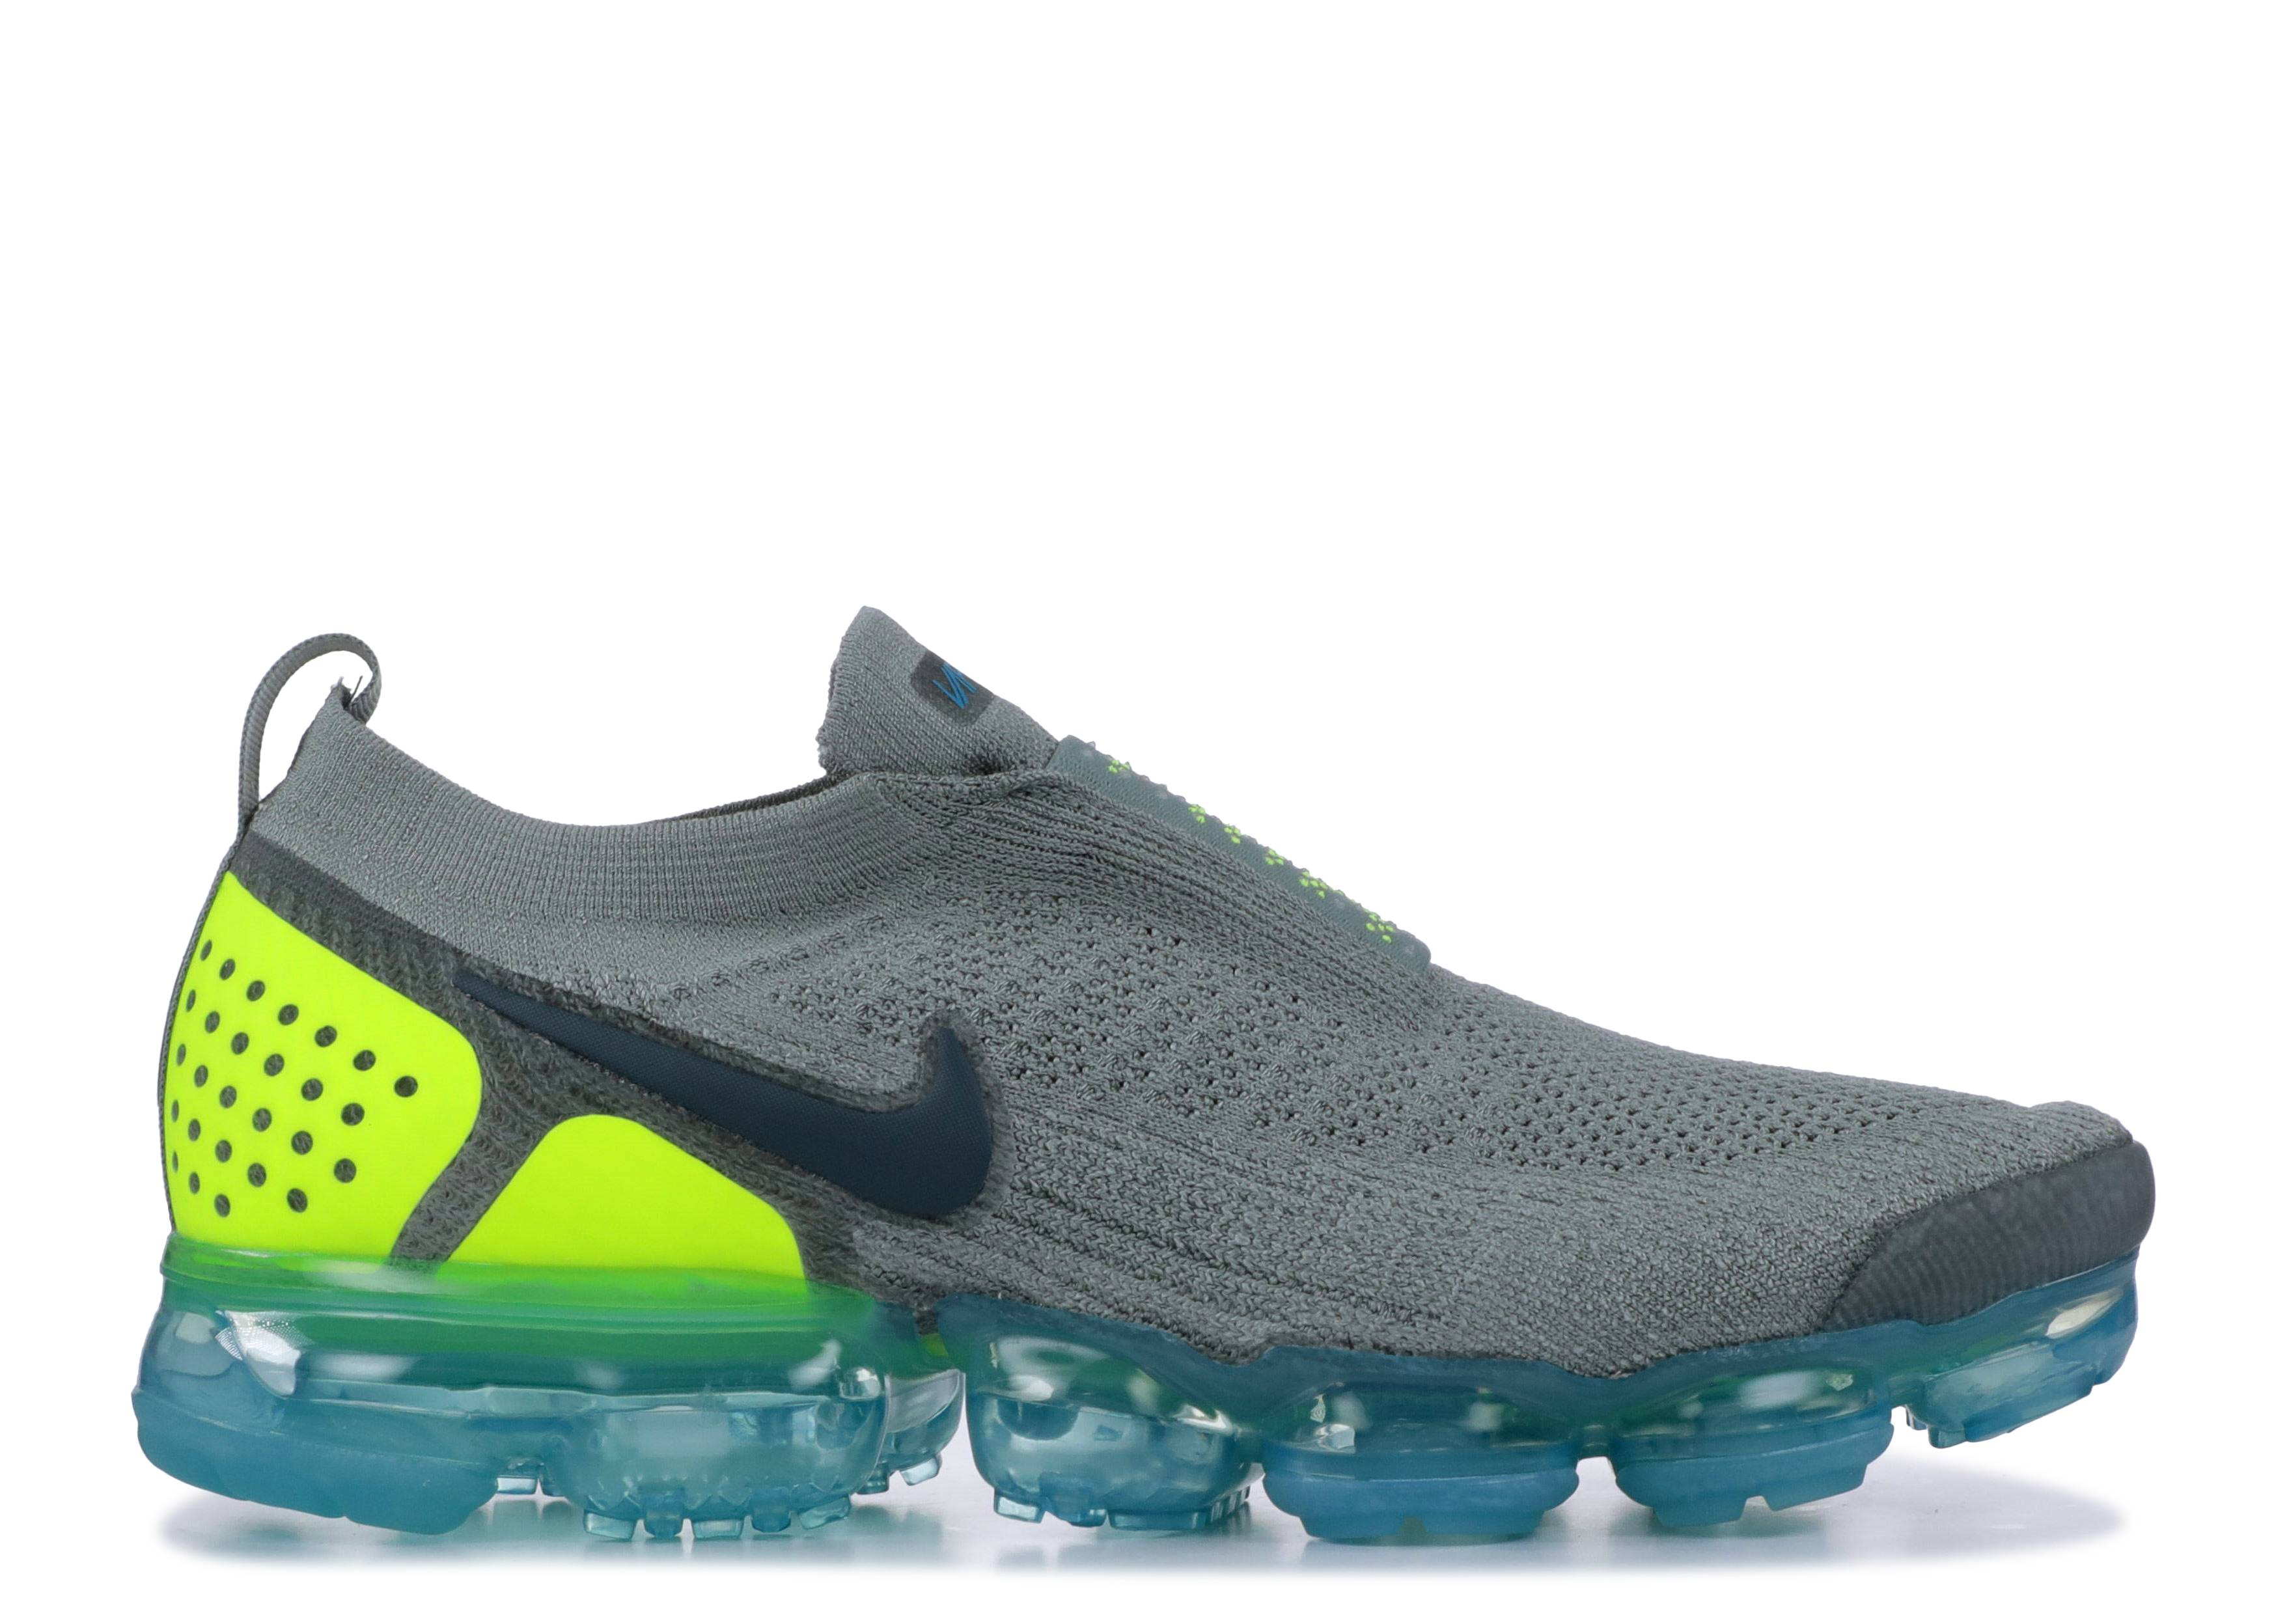 fef6137aaf7 Nike Air Vapormax Fk Moc 2 - Nike - ah7006 300 - mica green volt-neo ...